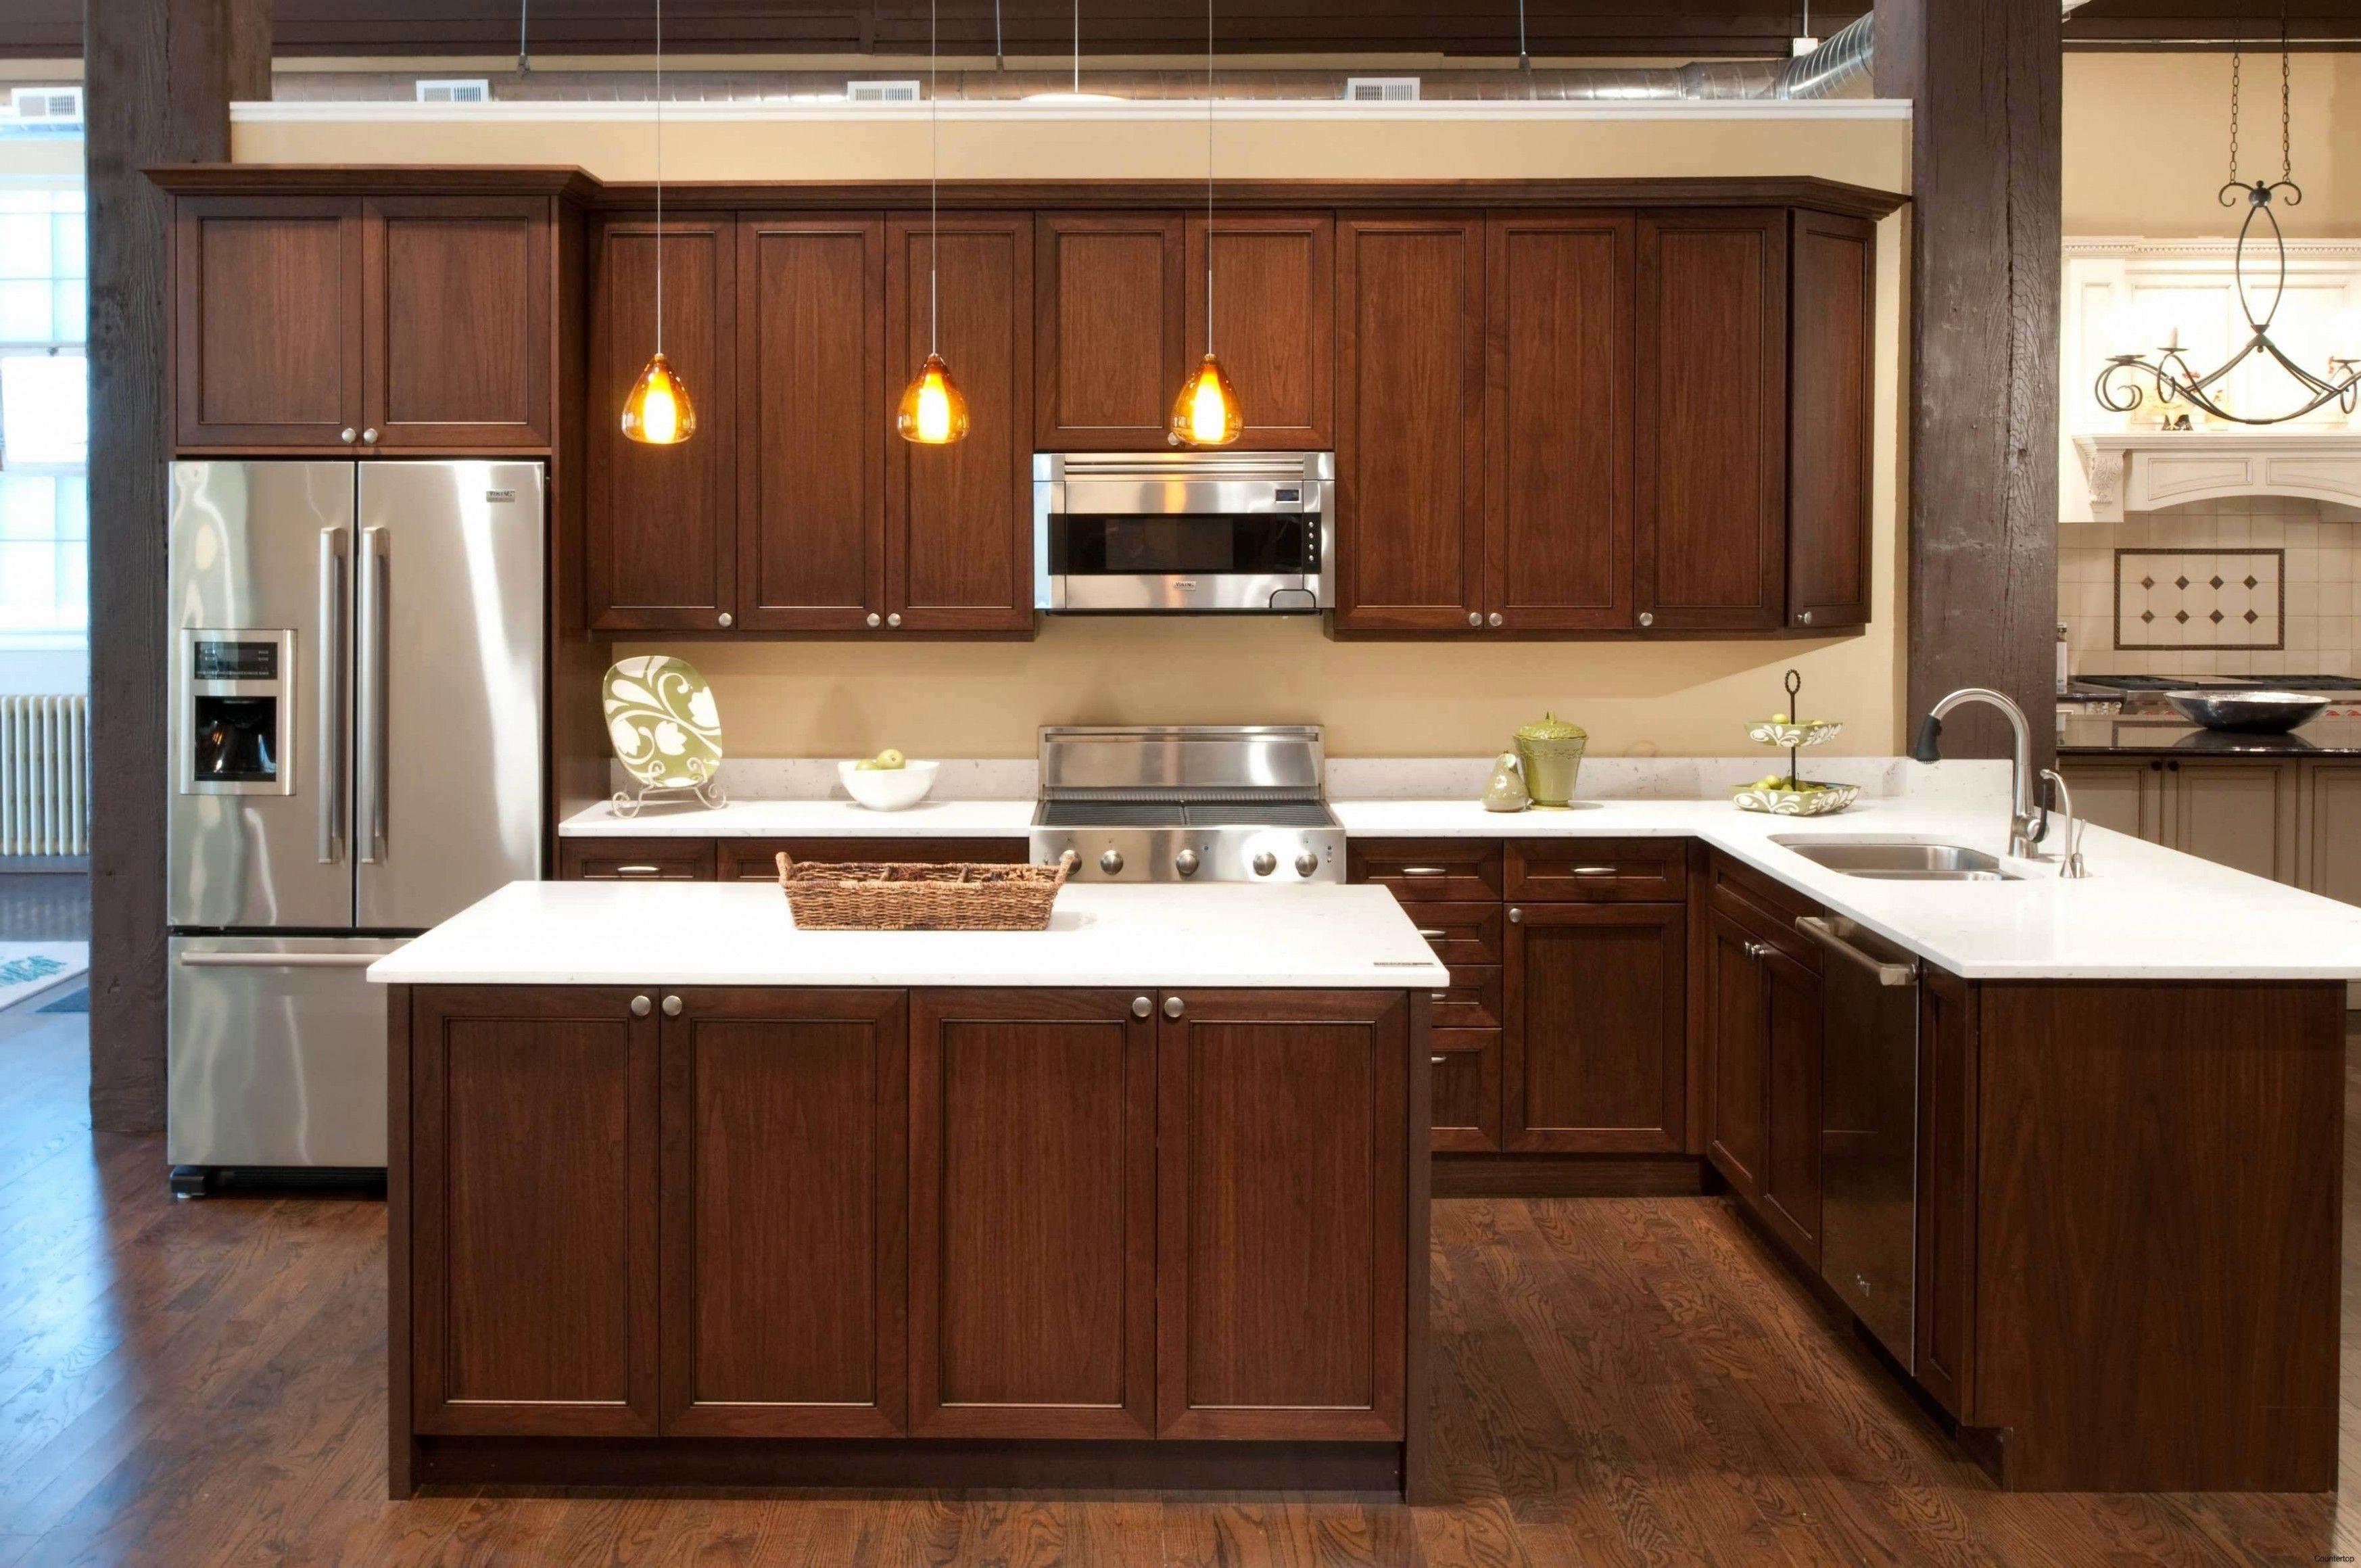 Craigslist Missouri Used Kitchen Cabinets For Sale Anyone ...